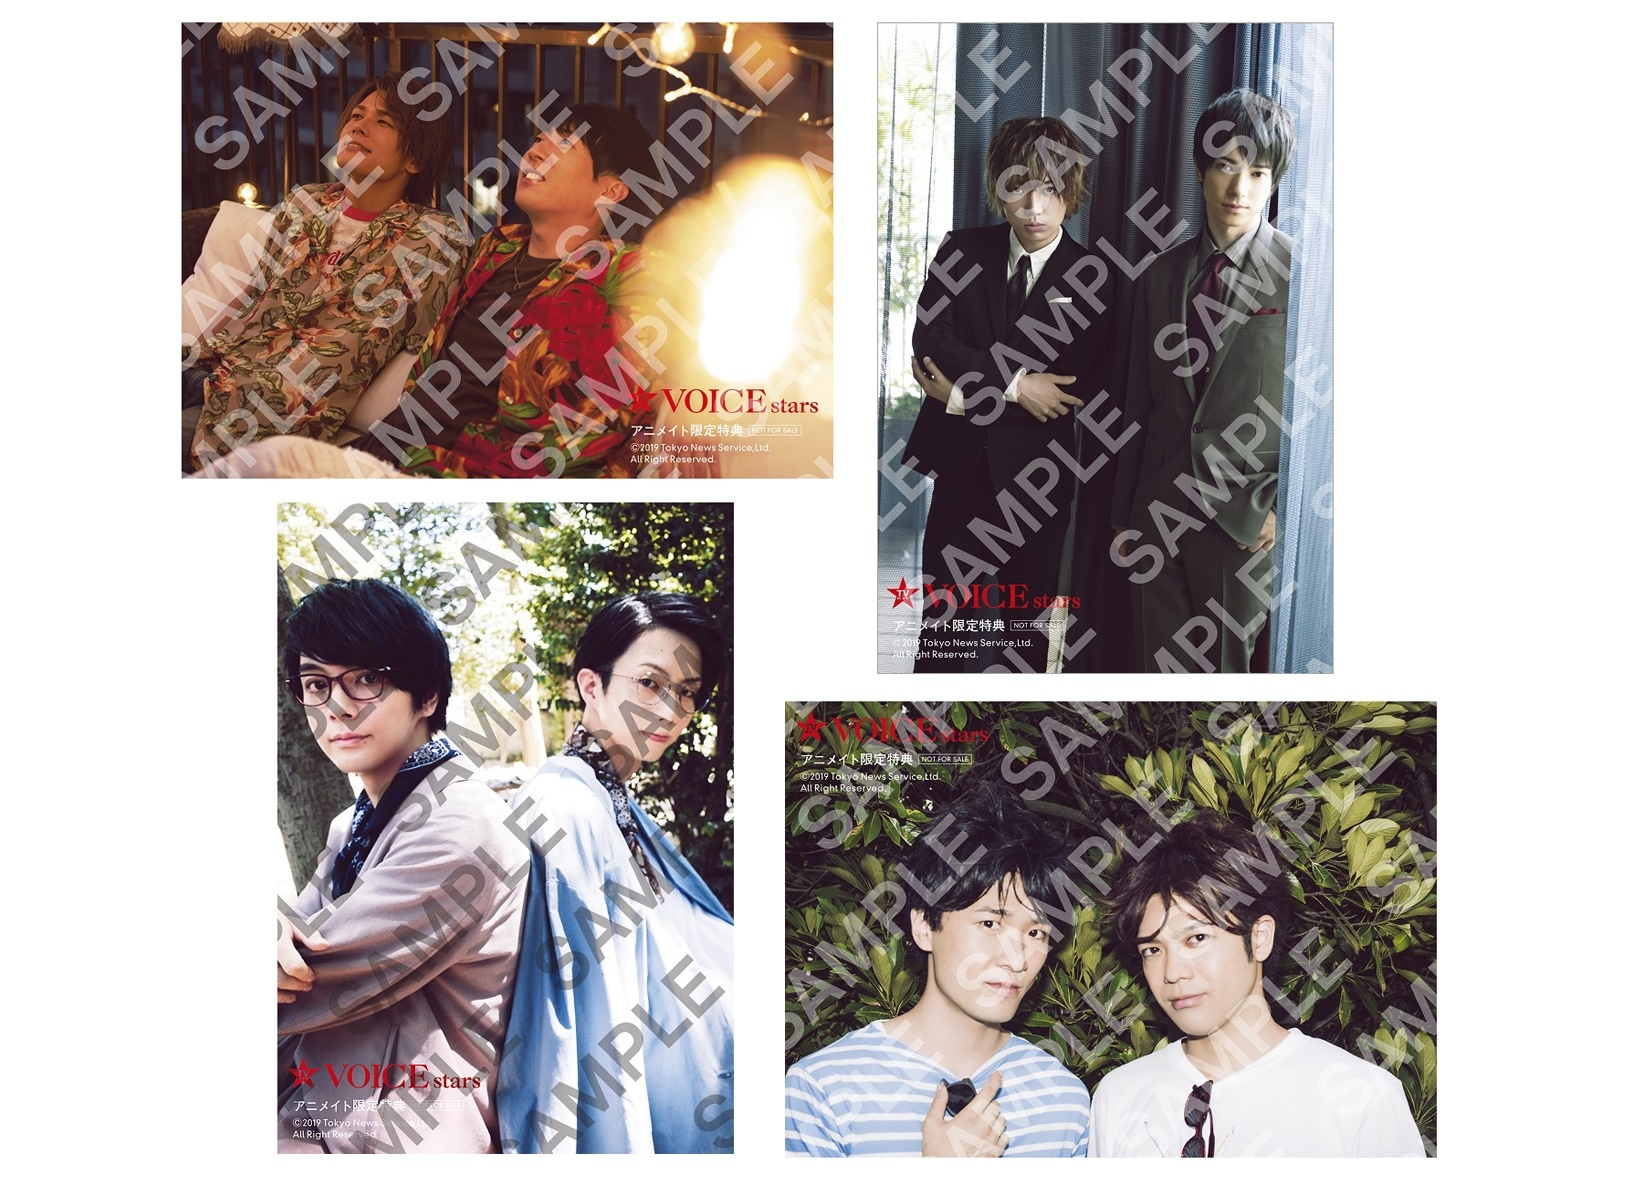 「TVガイドVOICE STARS vol.11」9月28日(土)発売